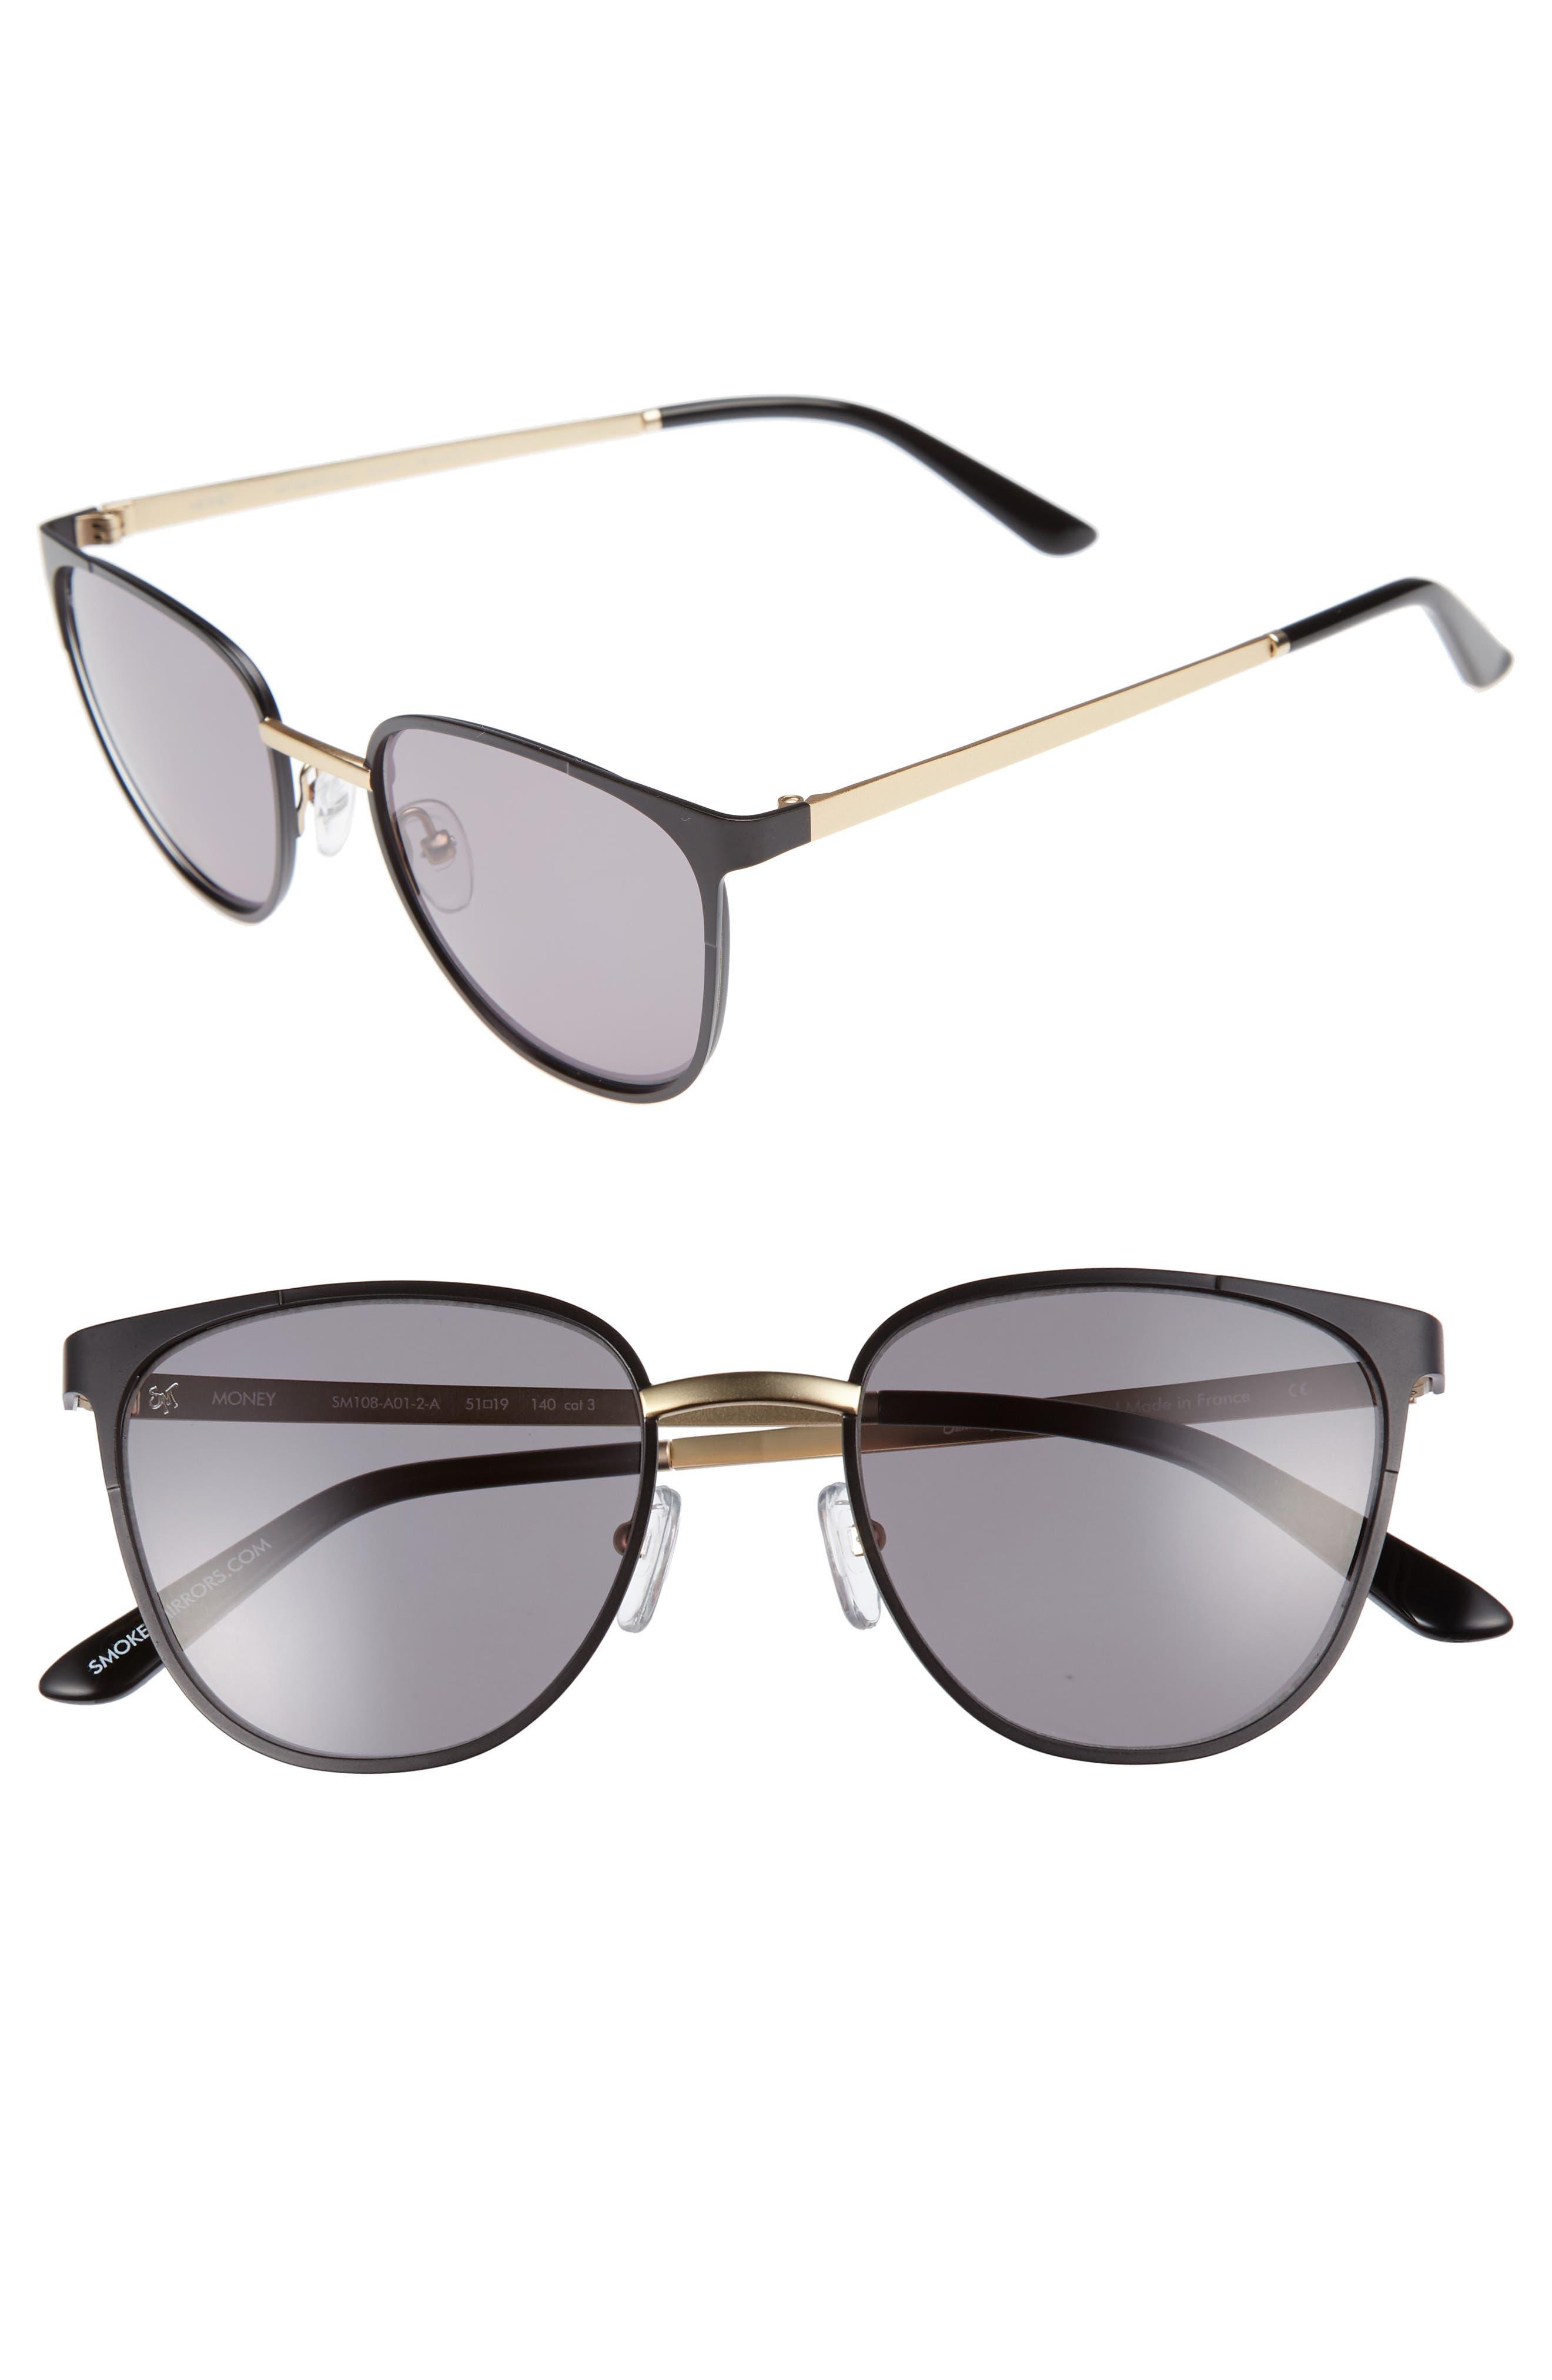 Money 51mm Sunglasses,                             Main thumbnail 1, color,                             001